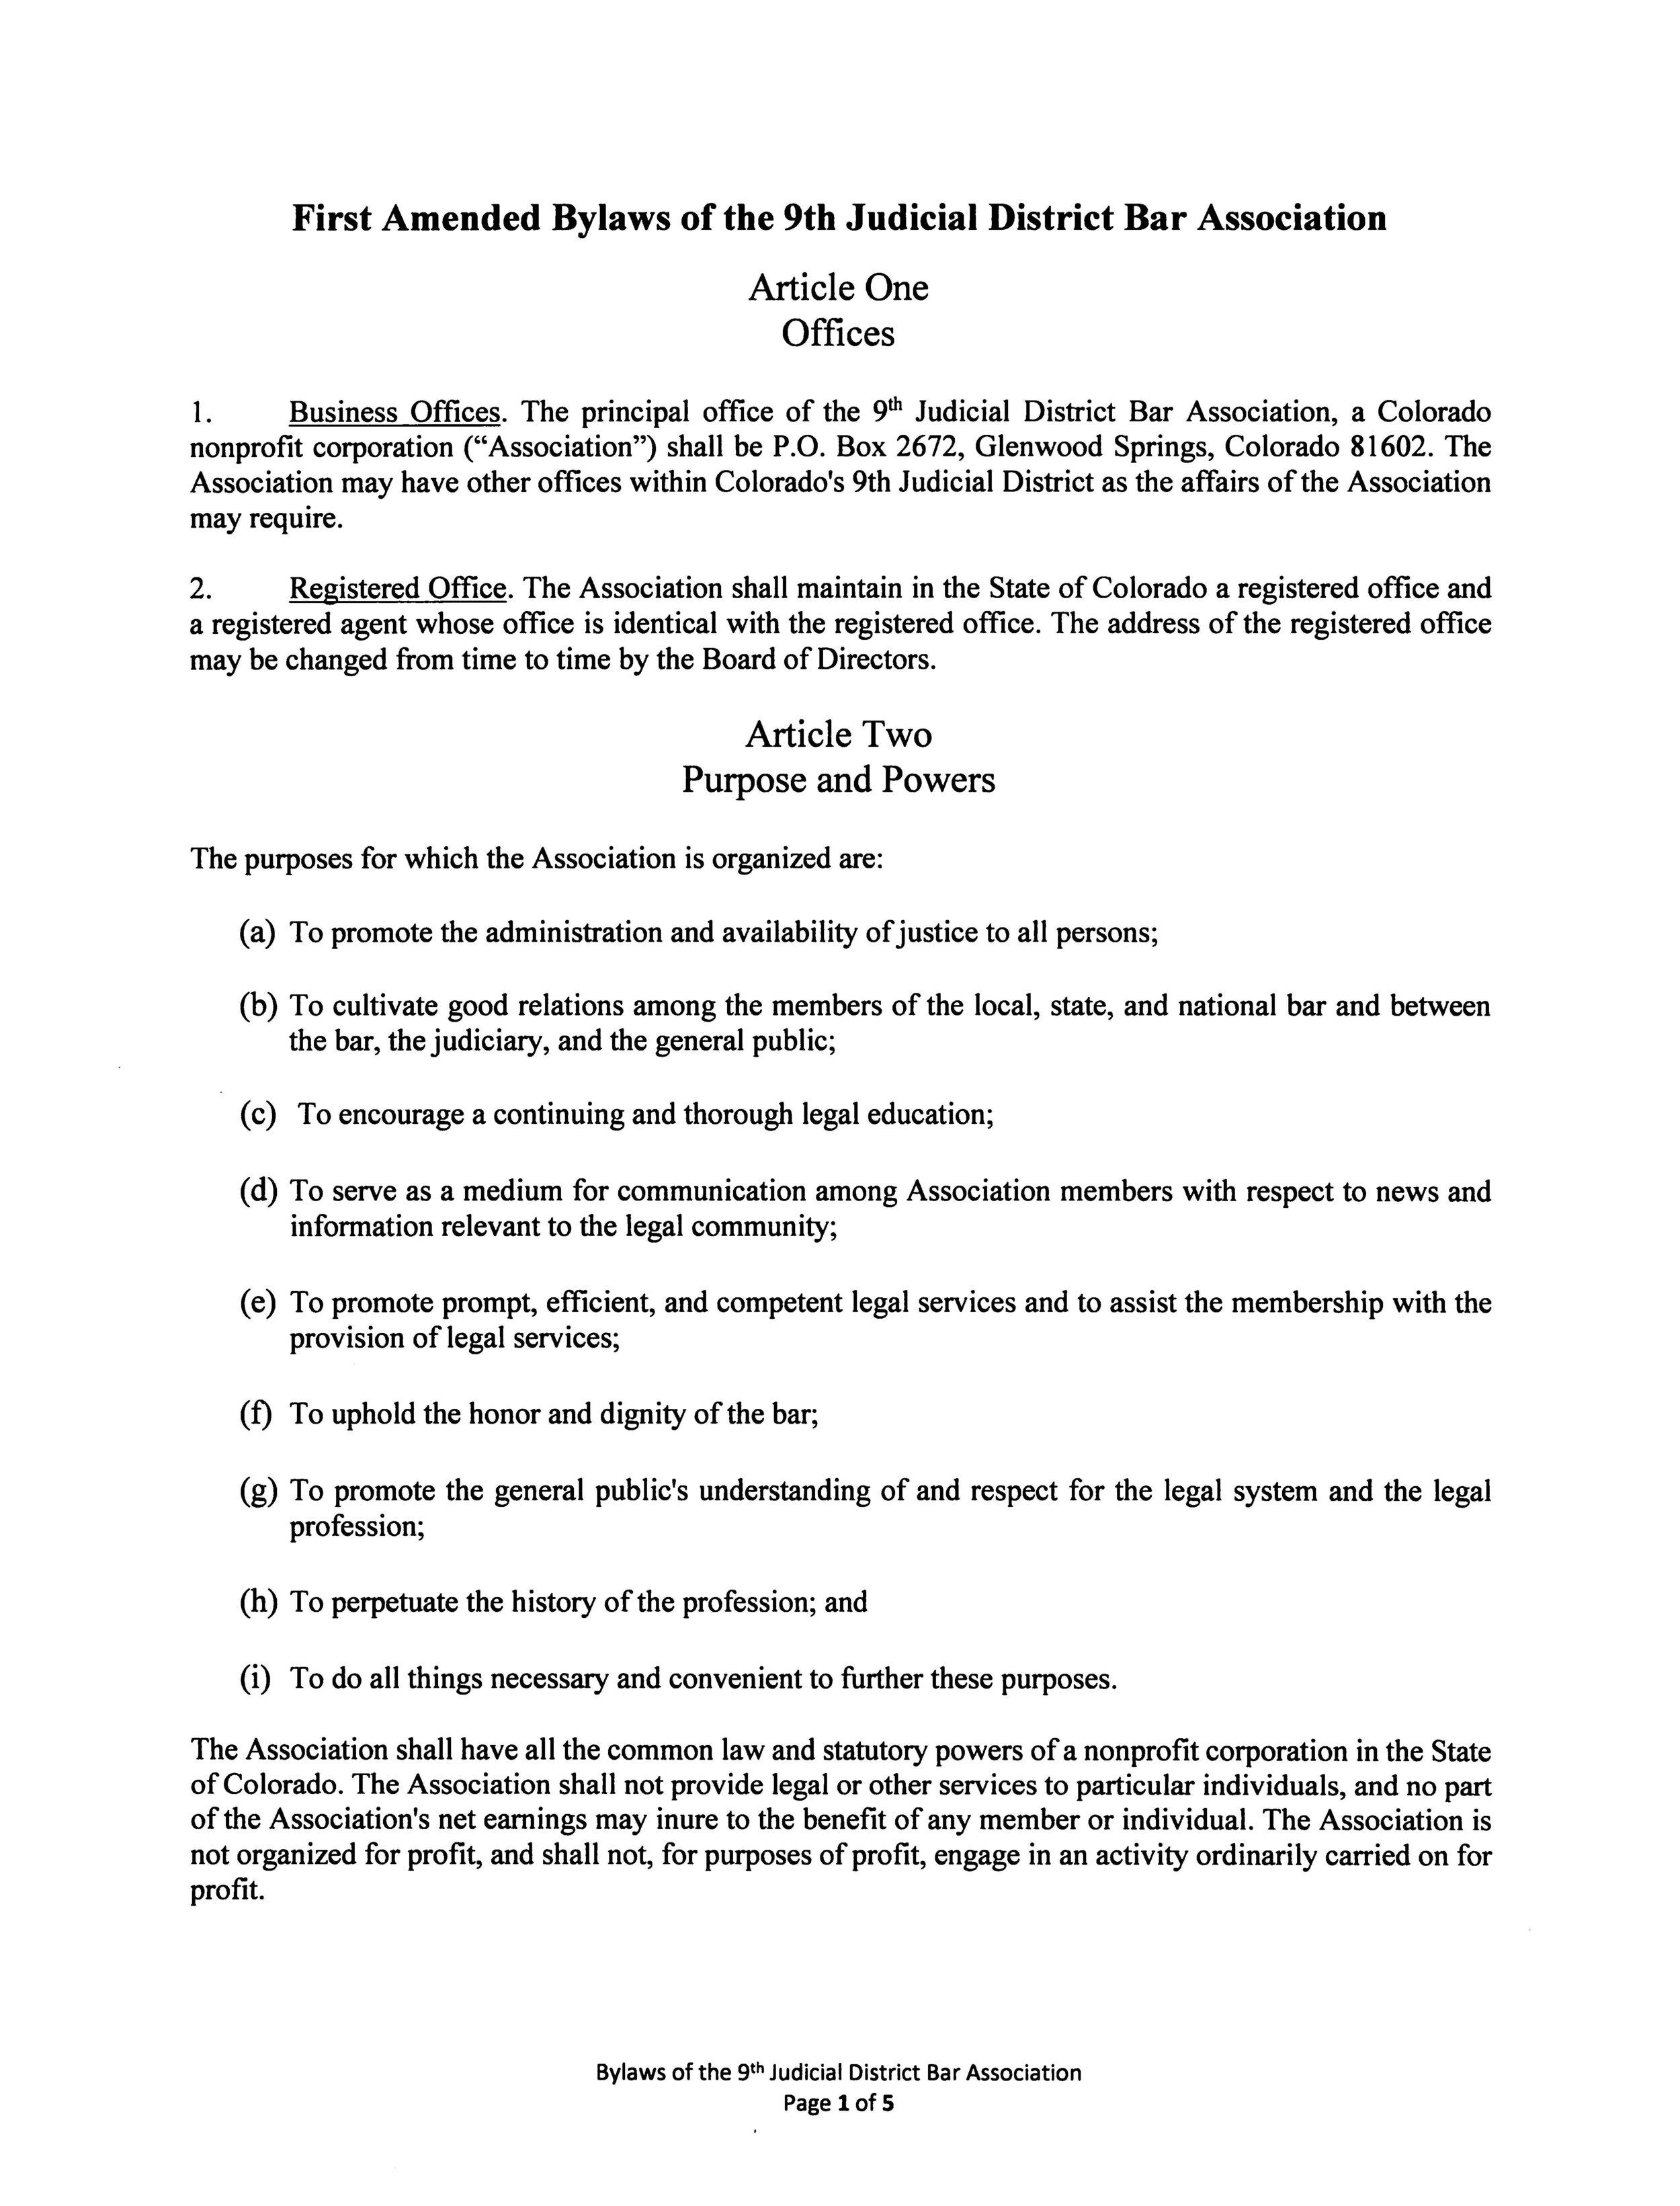 9JDBA Bylaws executed 3-7-17_Page_1.jpg